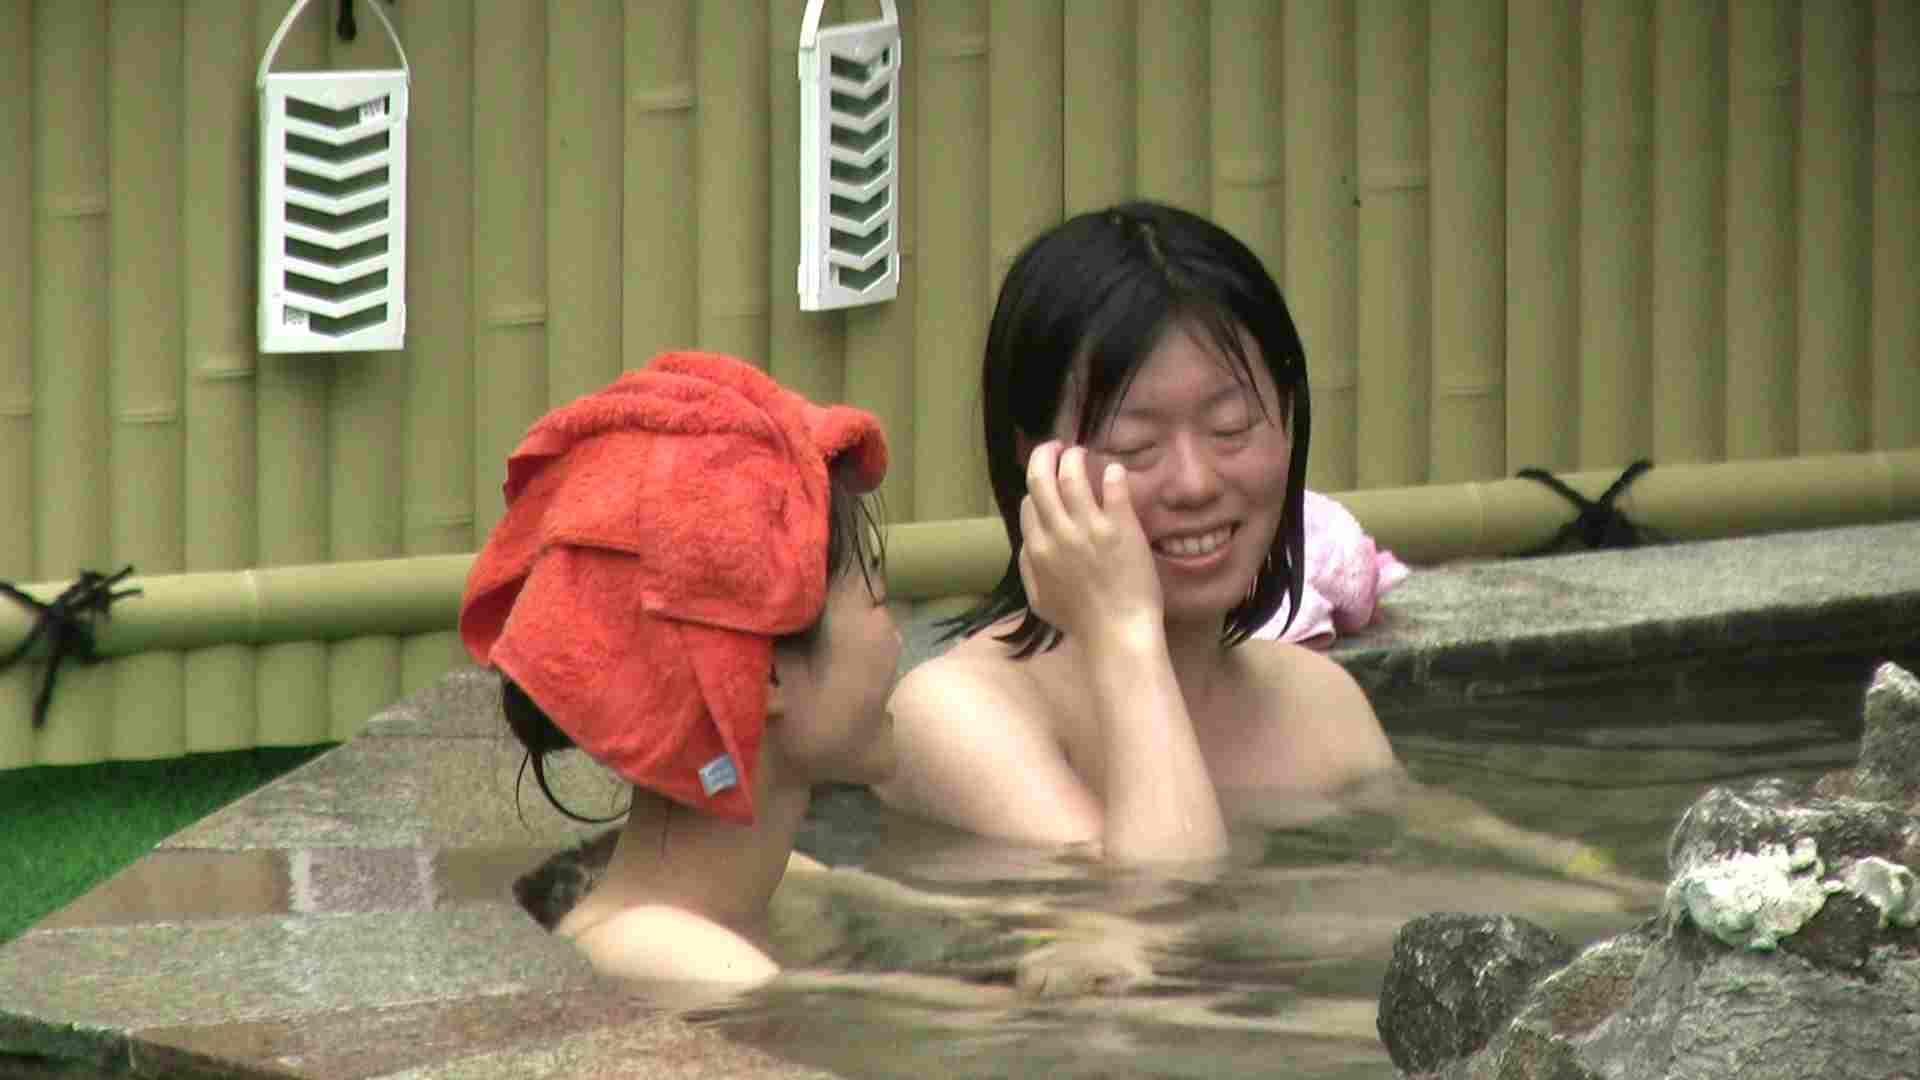 Aquaな露天風呂Vol.187 盗撮   HなOL  96pic 10